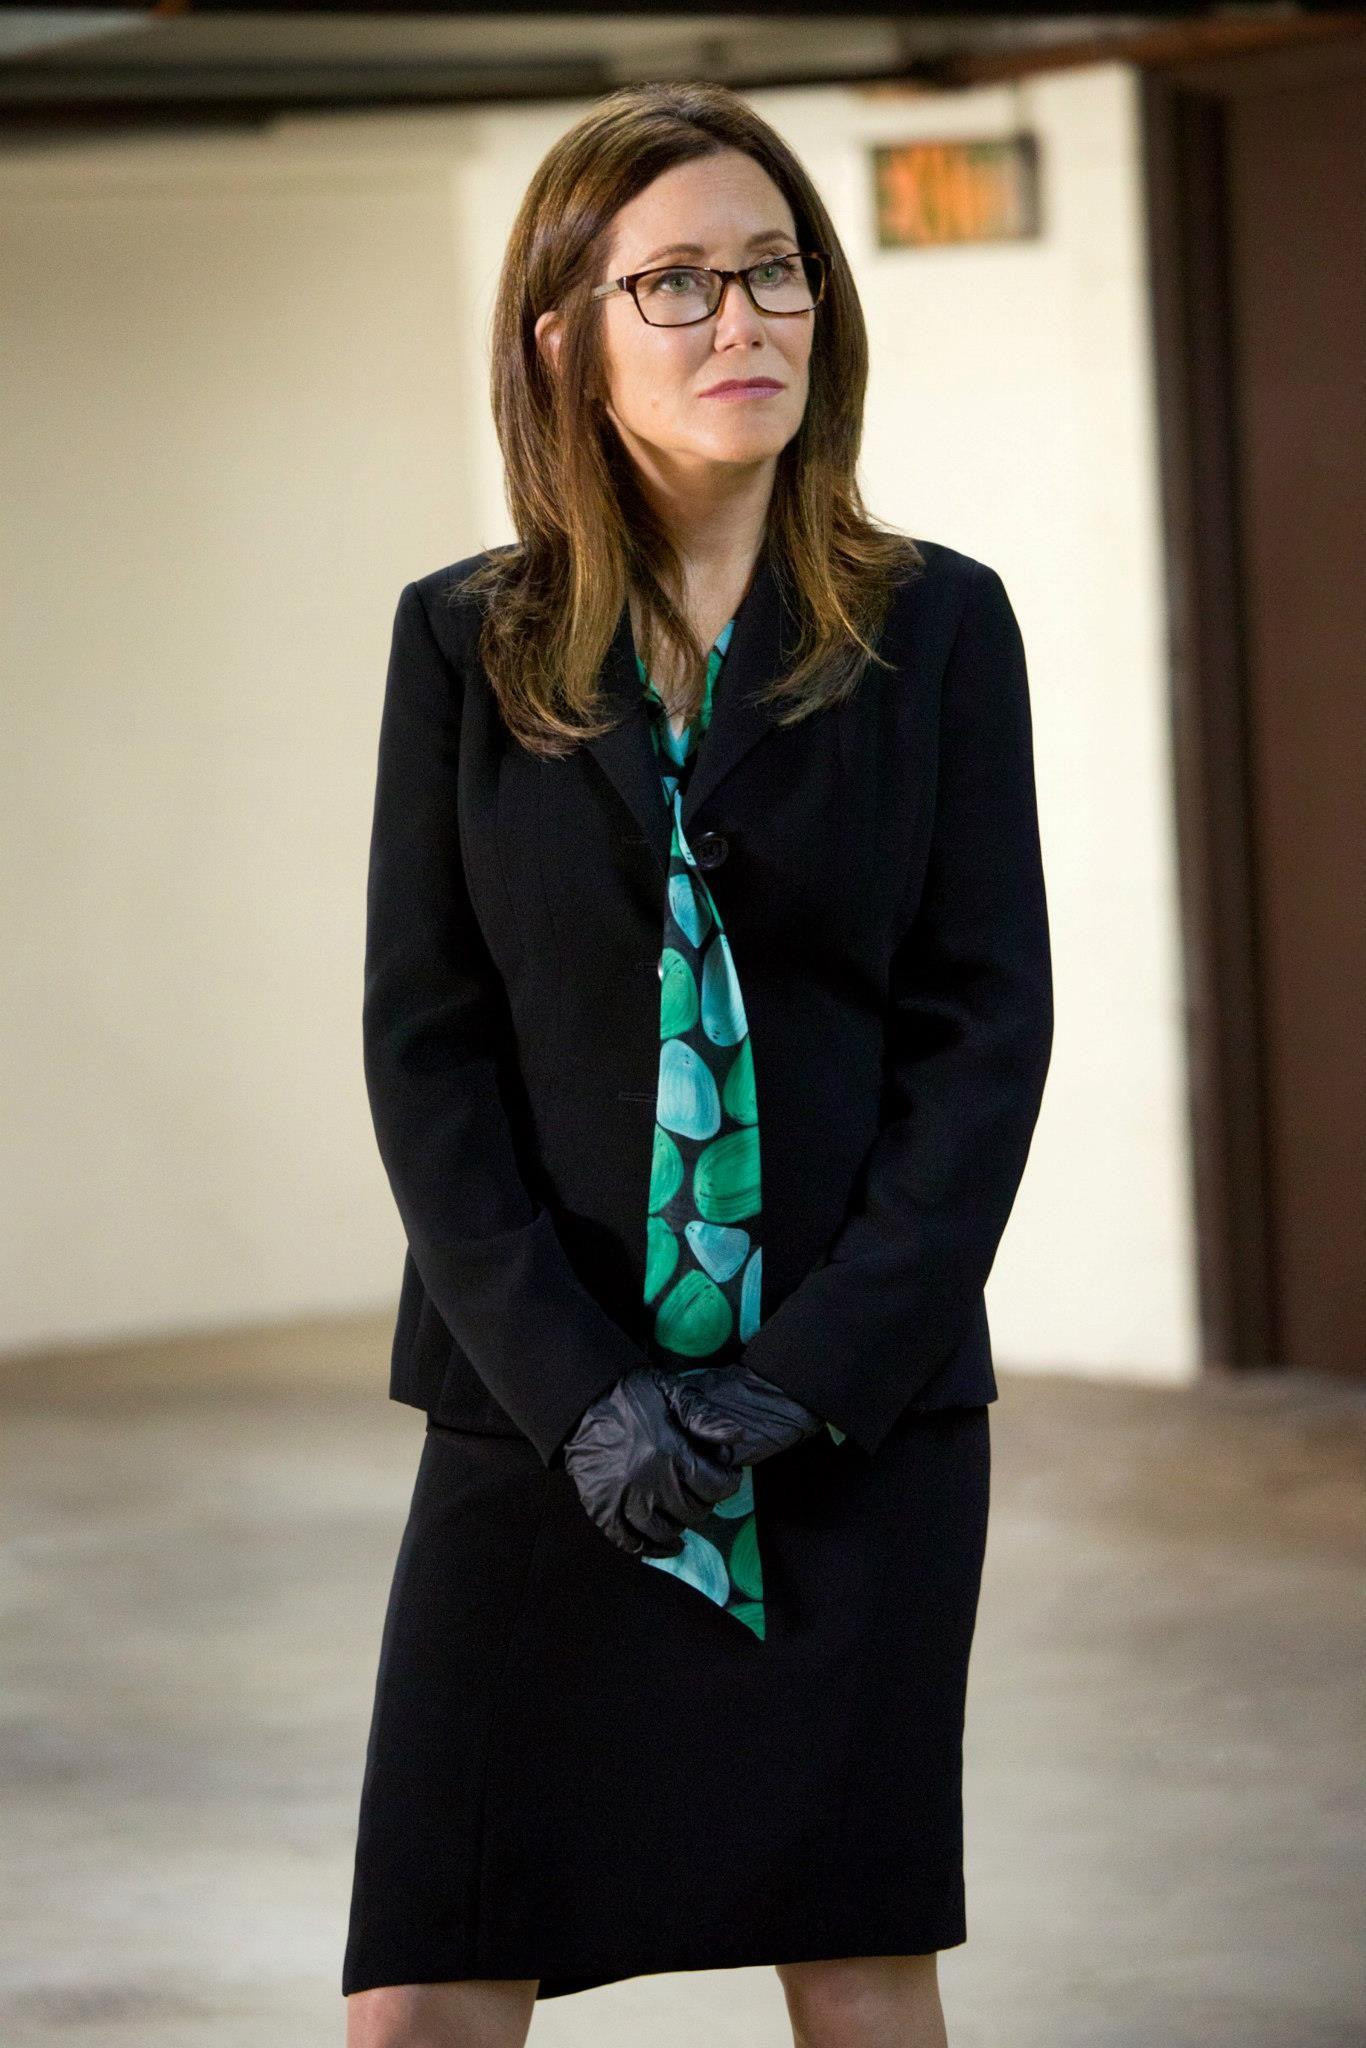 Major Crimes Season 1 Episode 10 Still Major Crimes Beautiful People Kyra Sedgwick